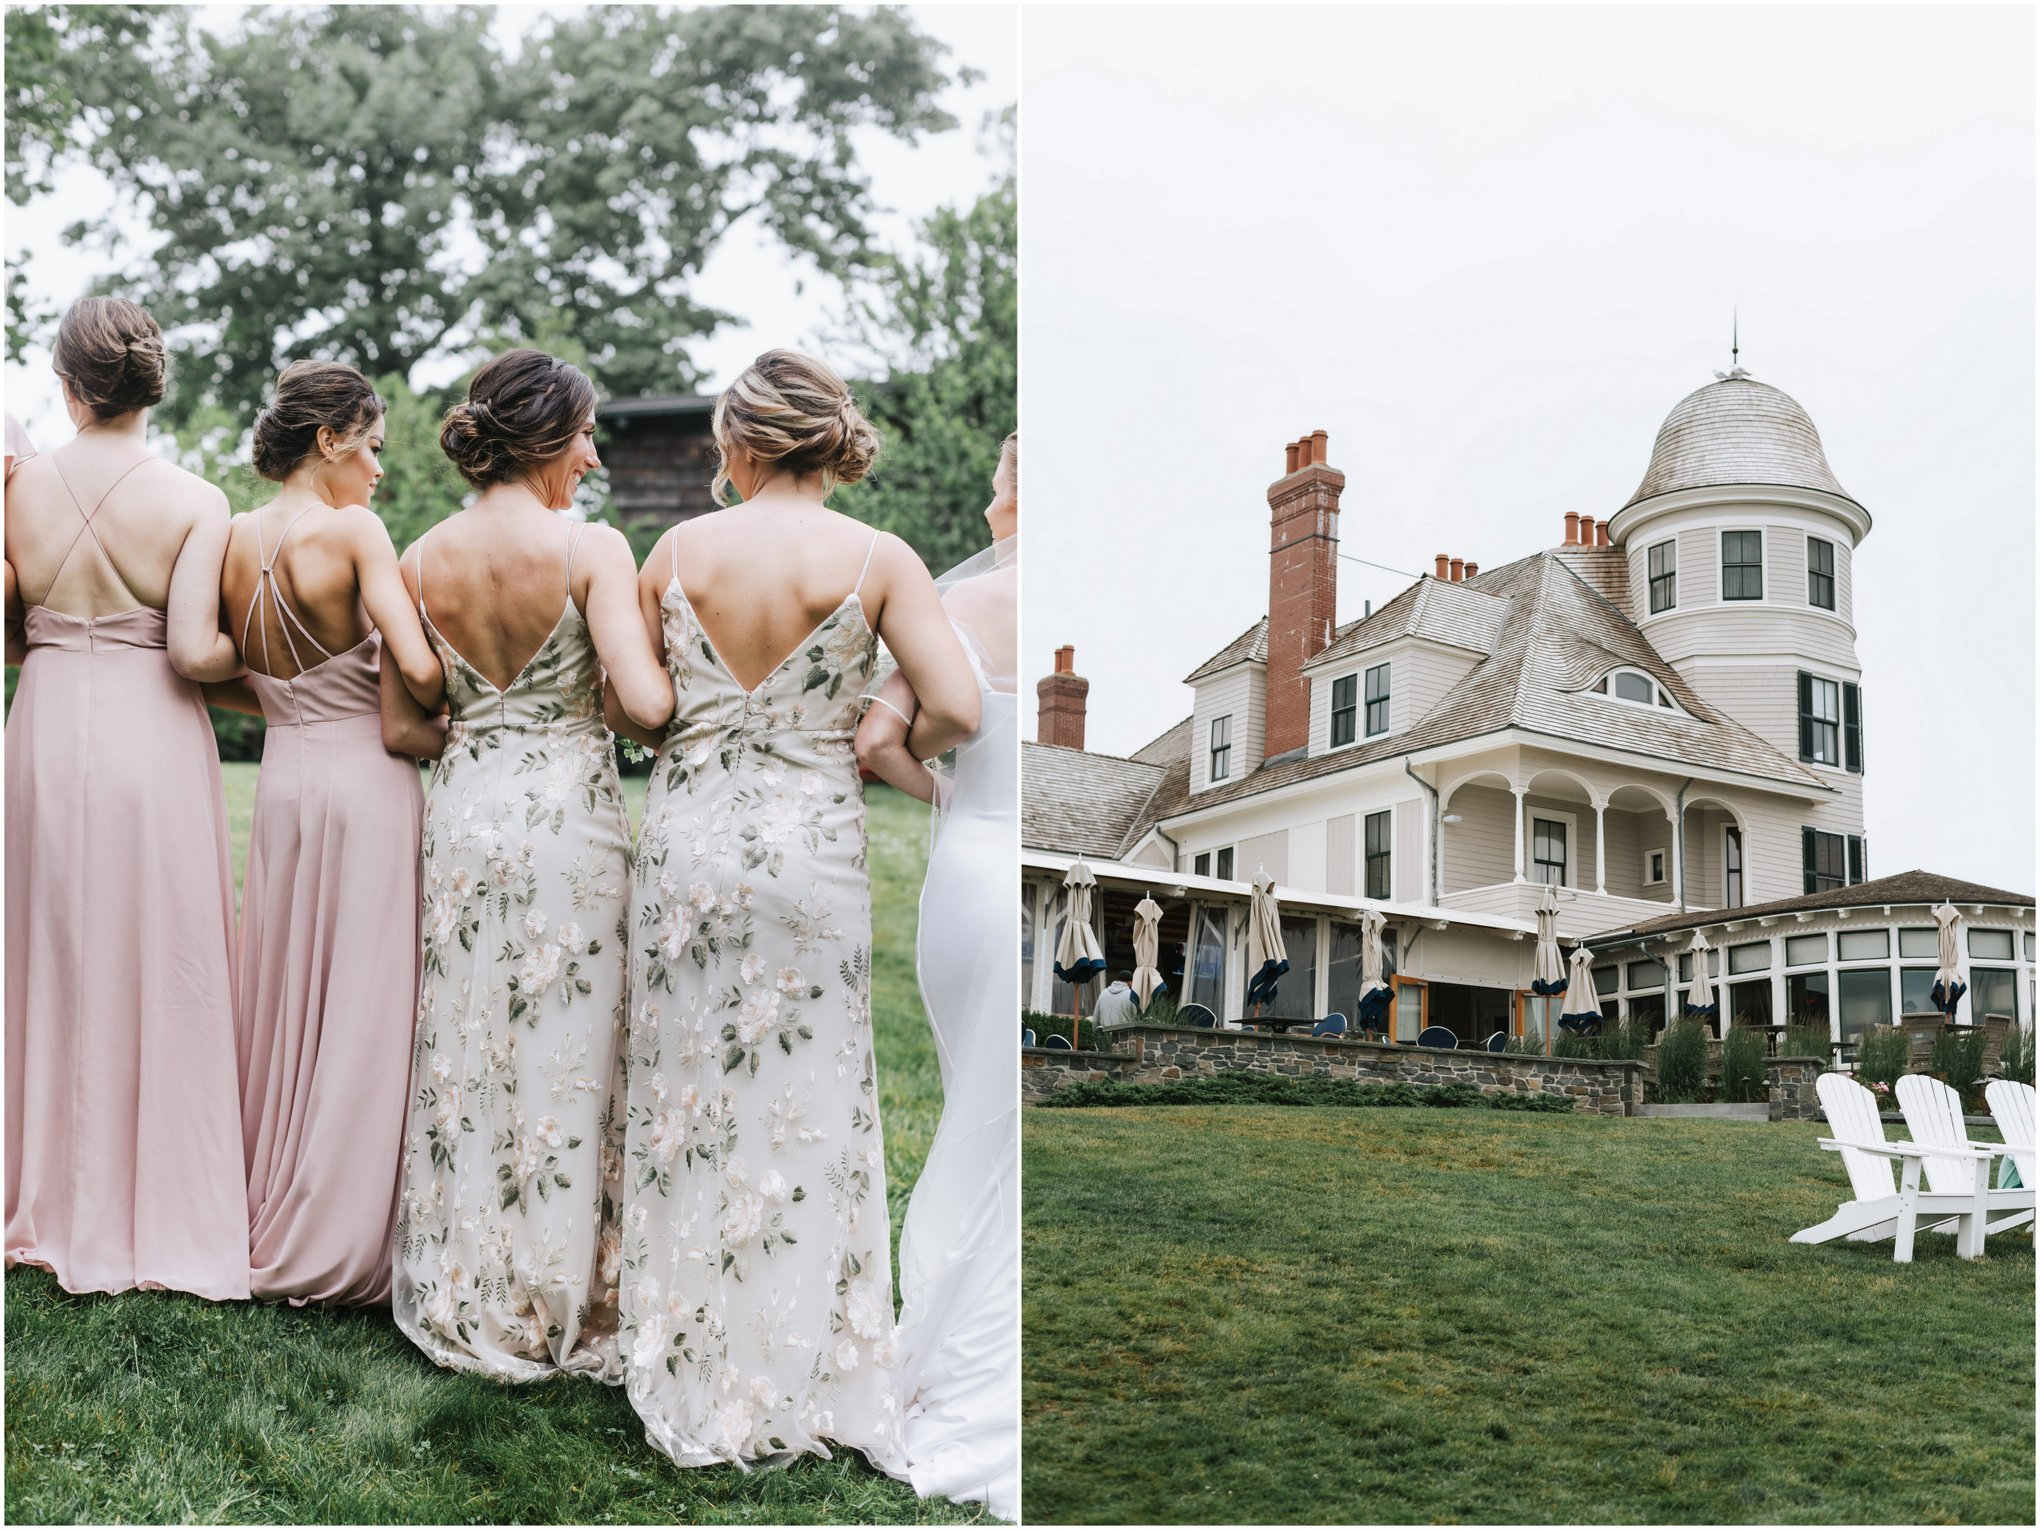 Castle-Hill-Inn-Newport-Wedding-21.jpg